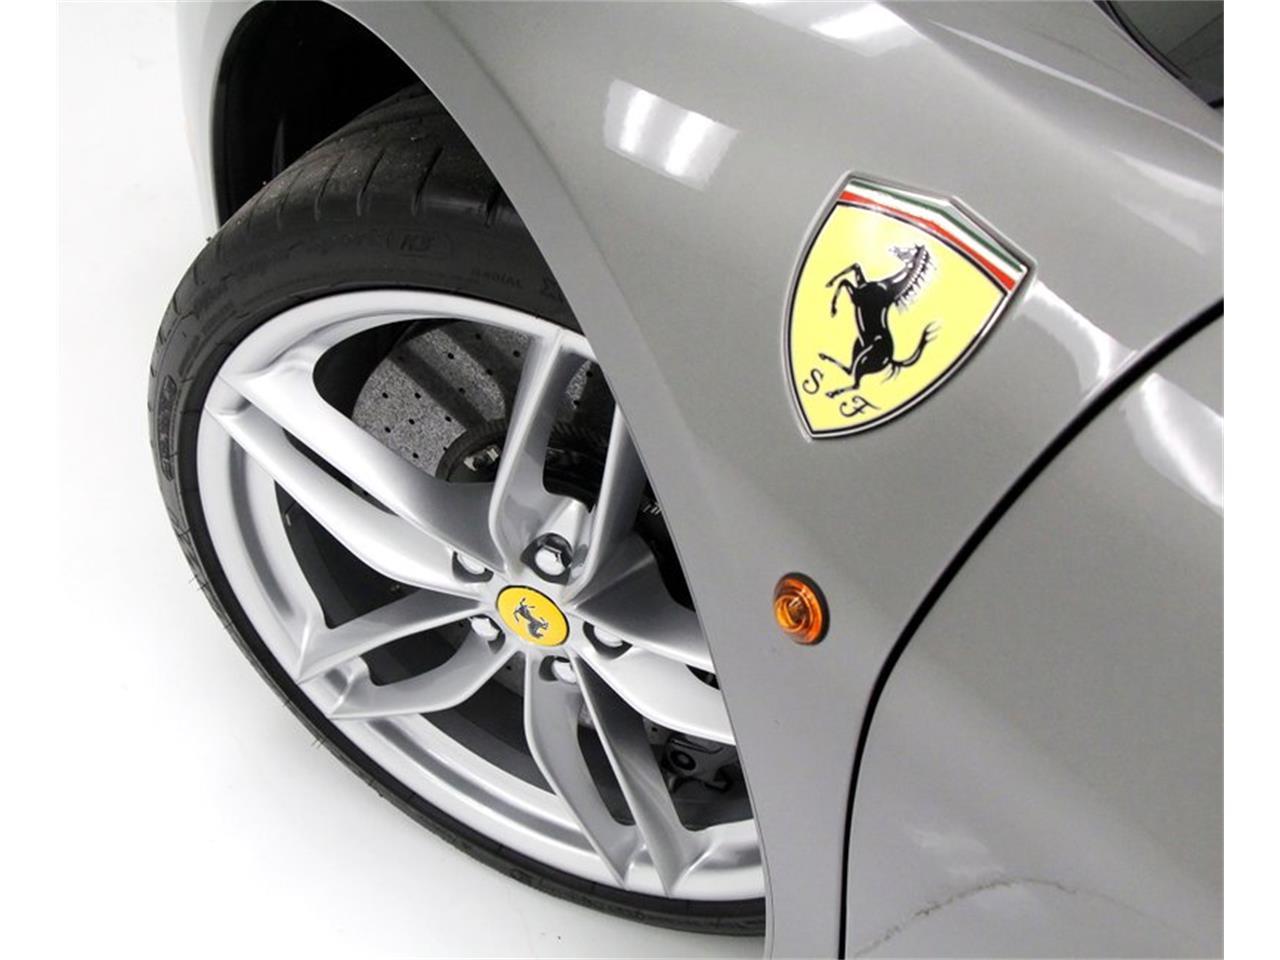 2016 Ferrari 488 (CC-1219003) for sale in Morgantown, Pennsylvania